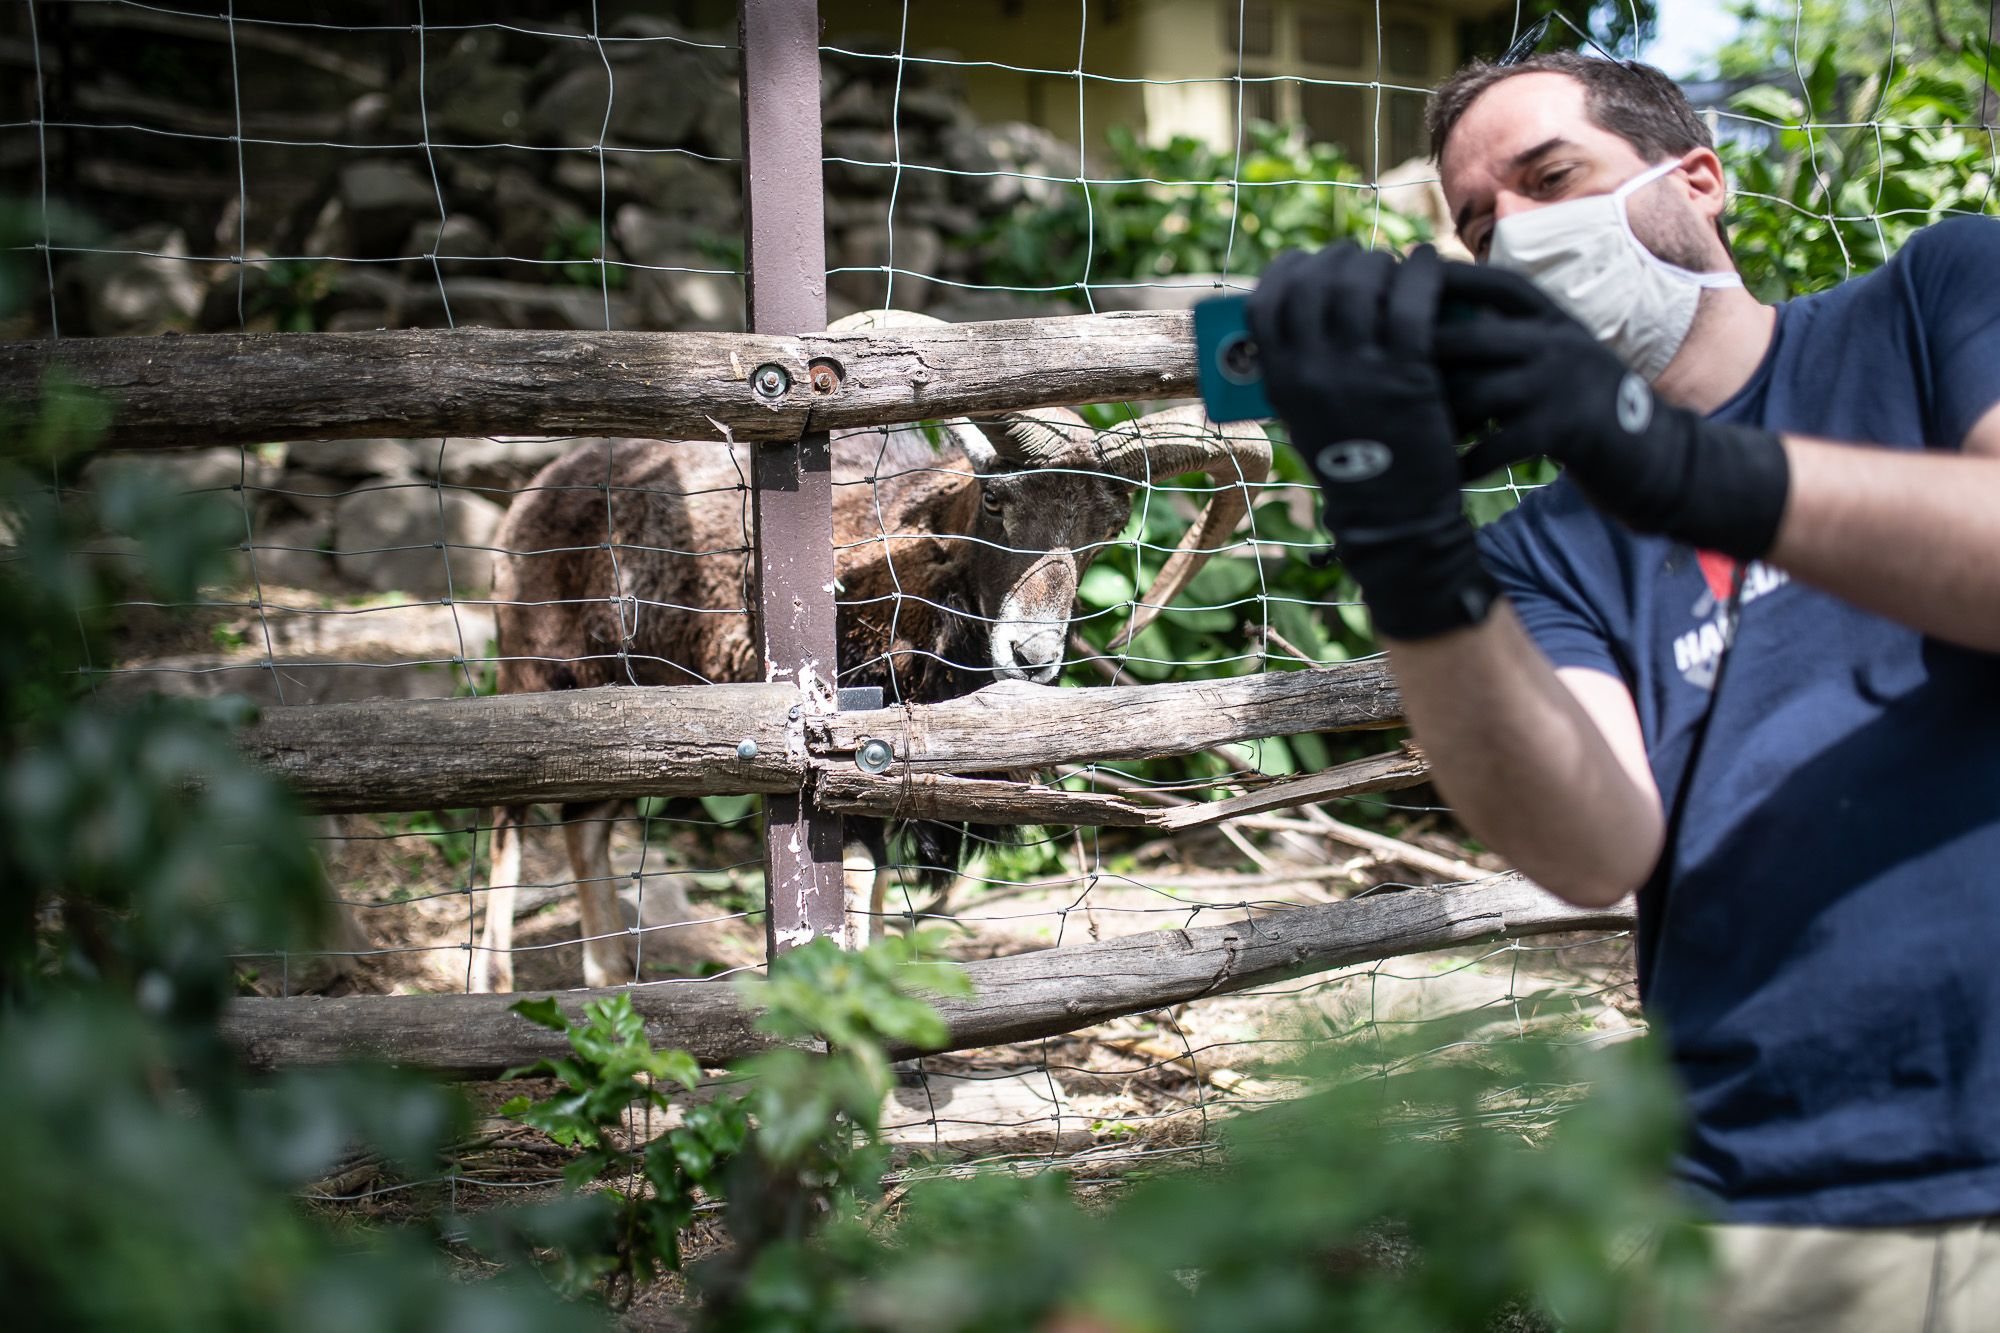 Mufi, a muflon a Budapesti Állatkertben